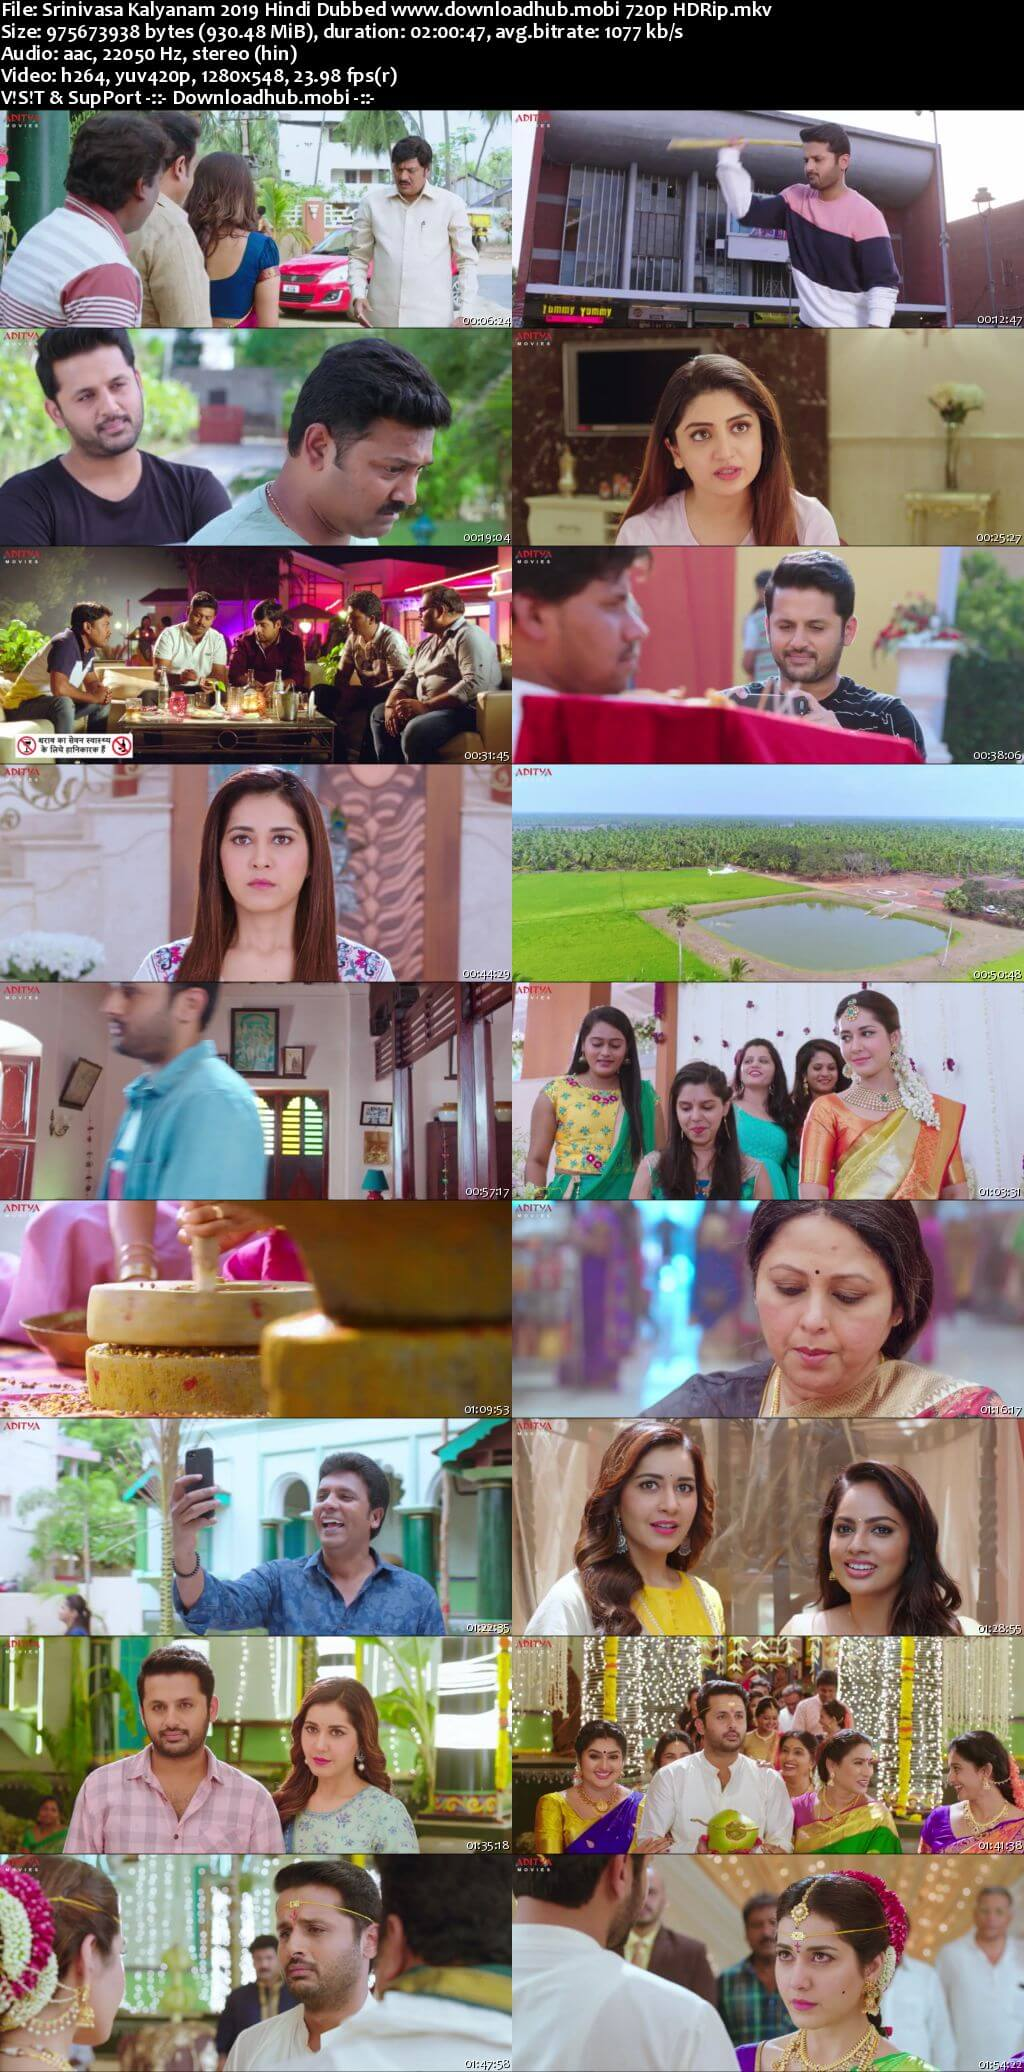 Srinivasa Kalyanam 2019 Hindi Dubbed 720p HDRip x264